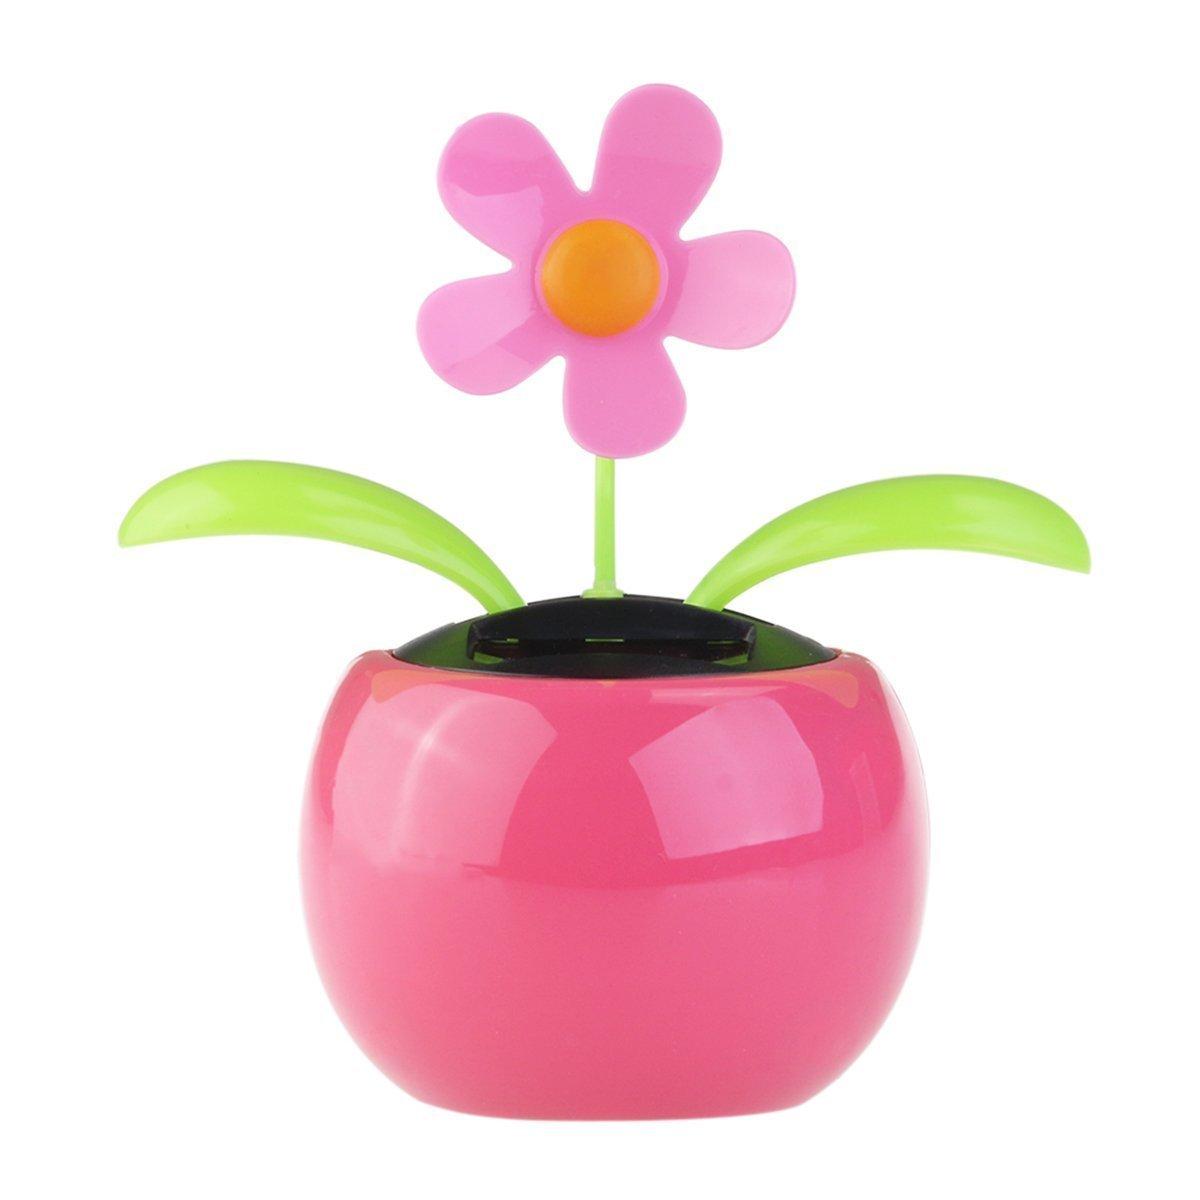 0b175459be59d9 Get Quotations · BinaryABC Flip Flap Moving Dancing Solar Power Flower  Flowerpot Swing Solar Car Toy(Random Color